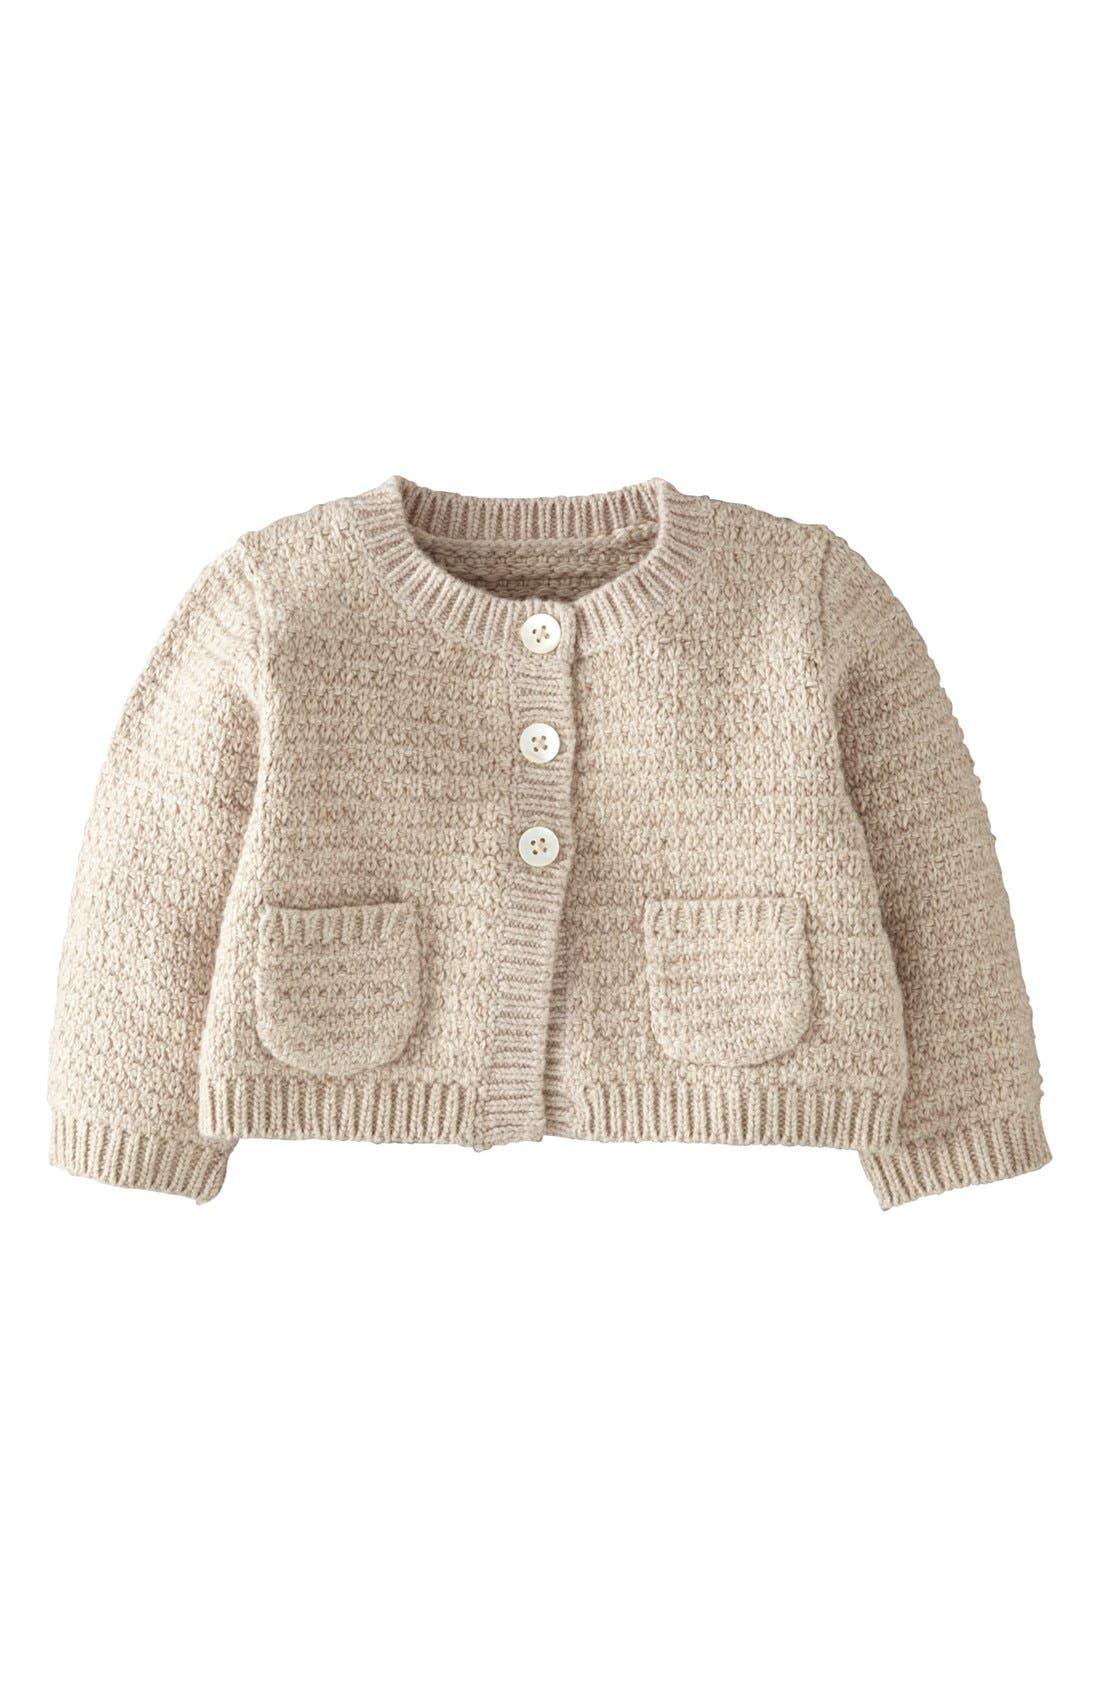 Alternate Image 1 Selected - Mini Boden Cardigan (Baby Girls)